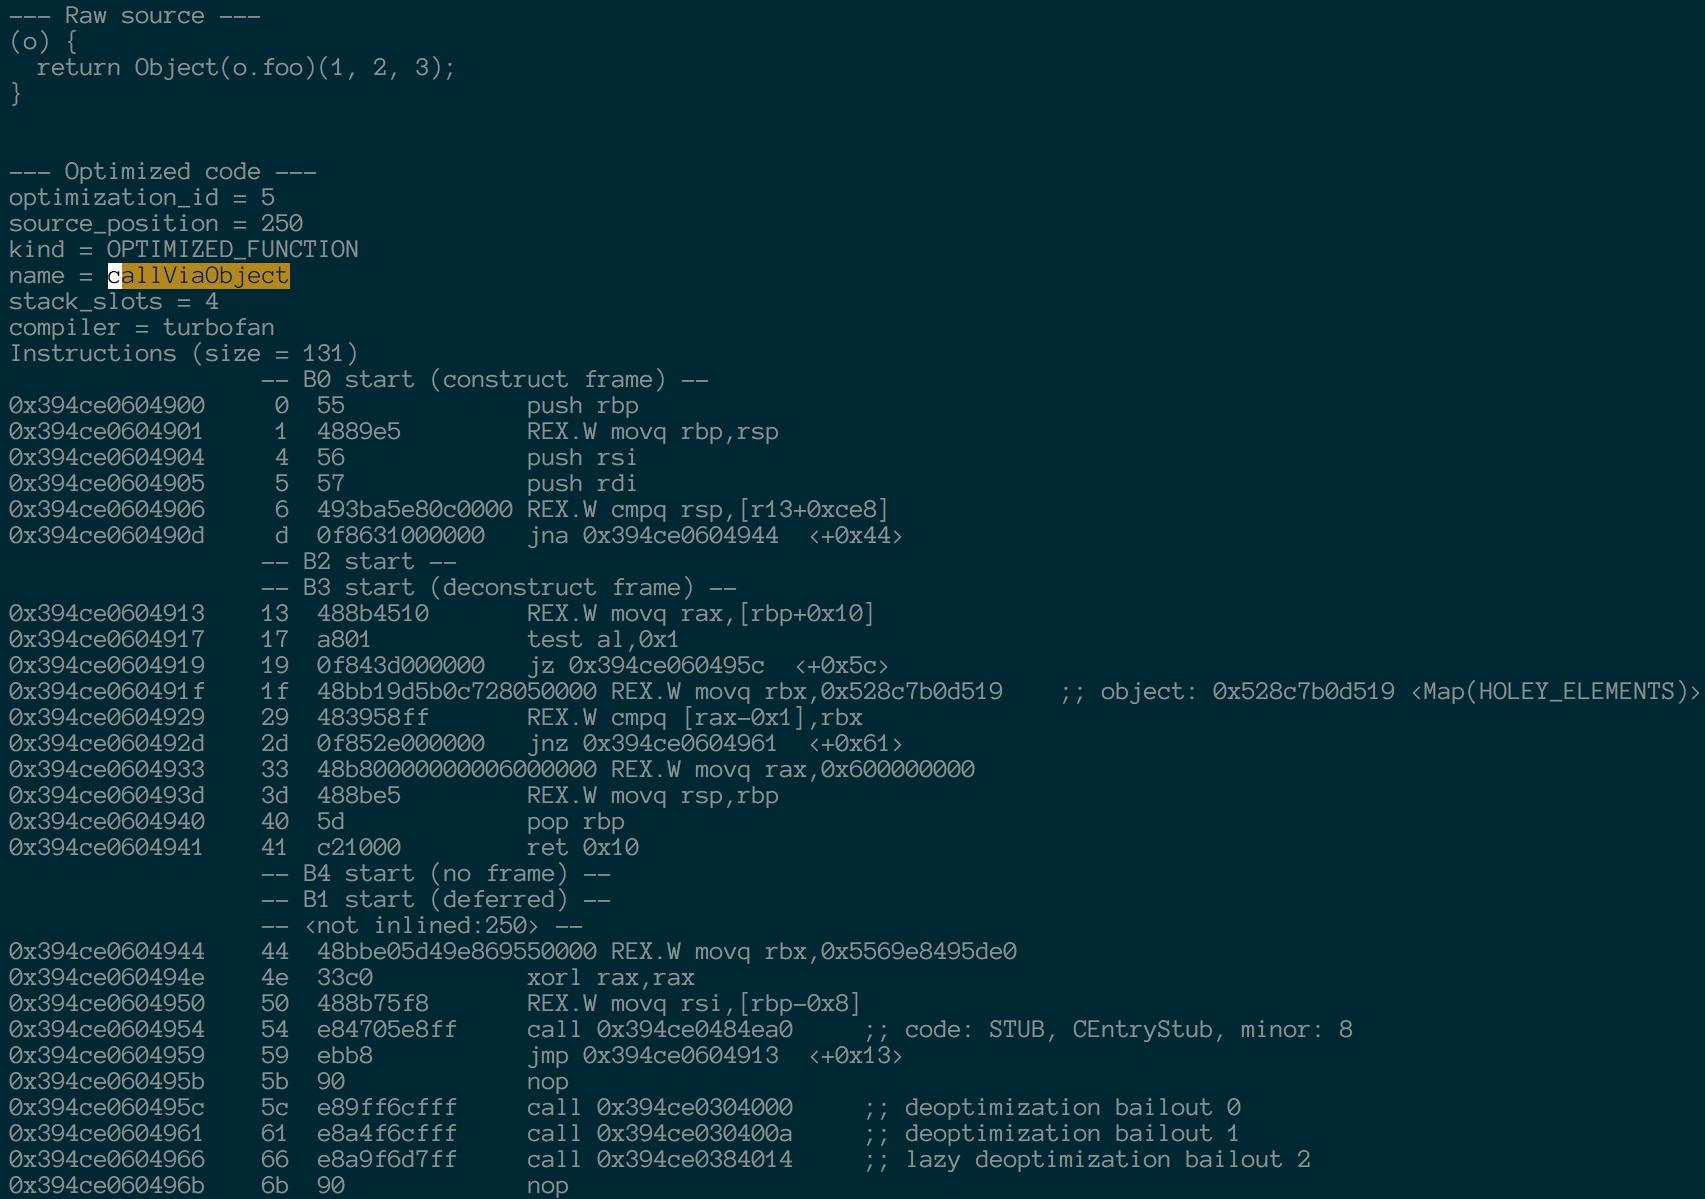 callViaObject optimized code (new)